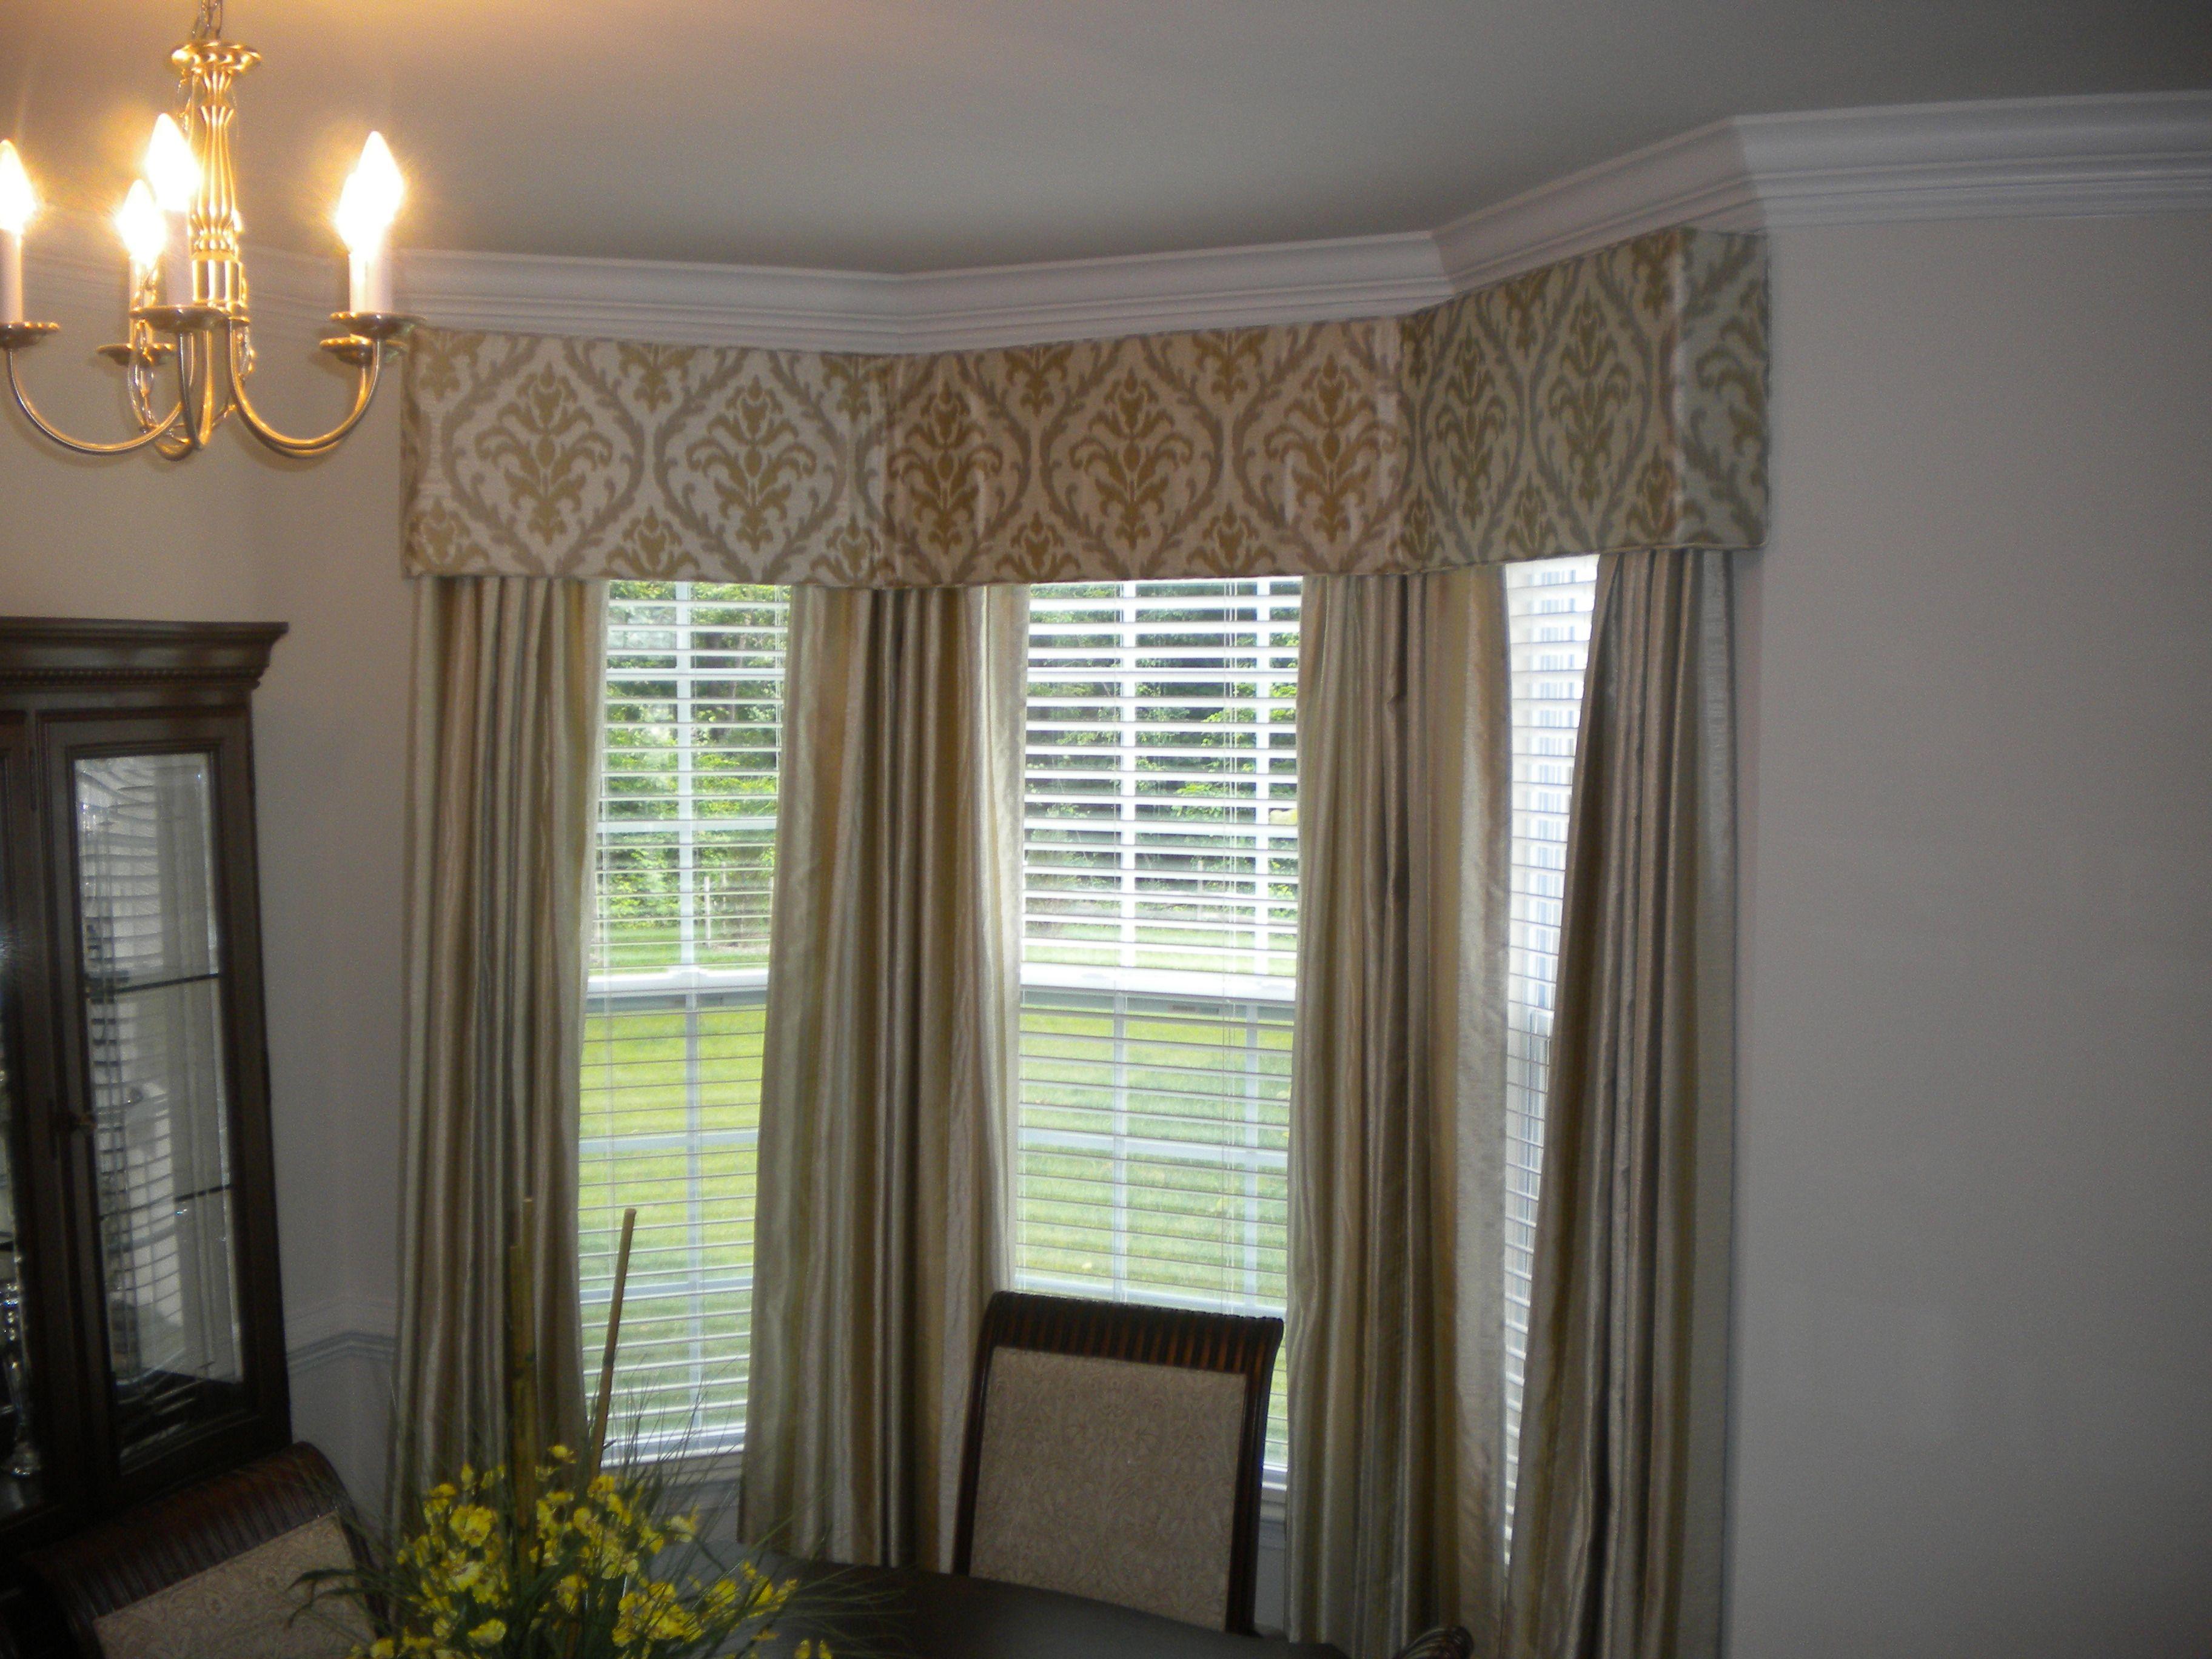 Best Curtain Rail for Bay Windows Ideas UK  Bay window curtain